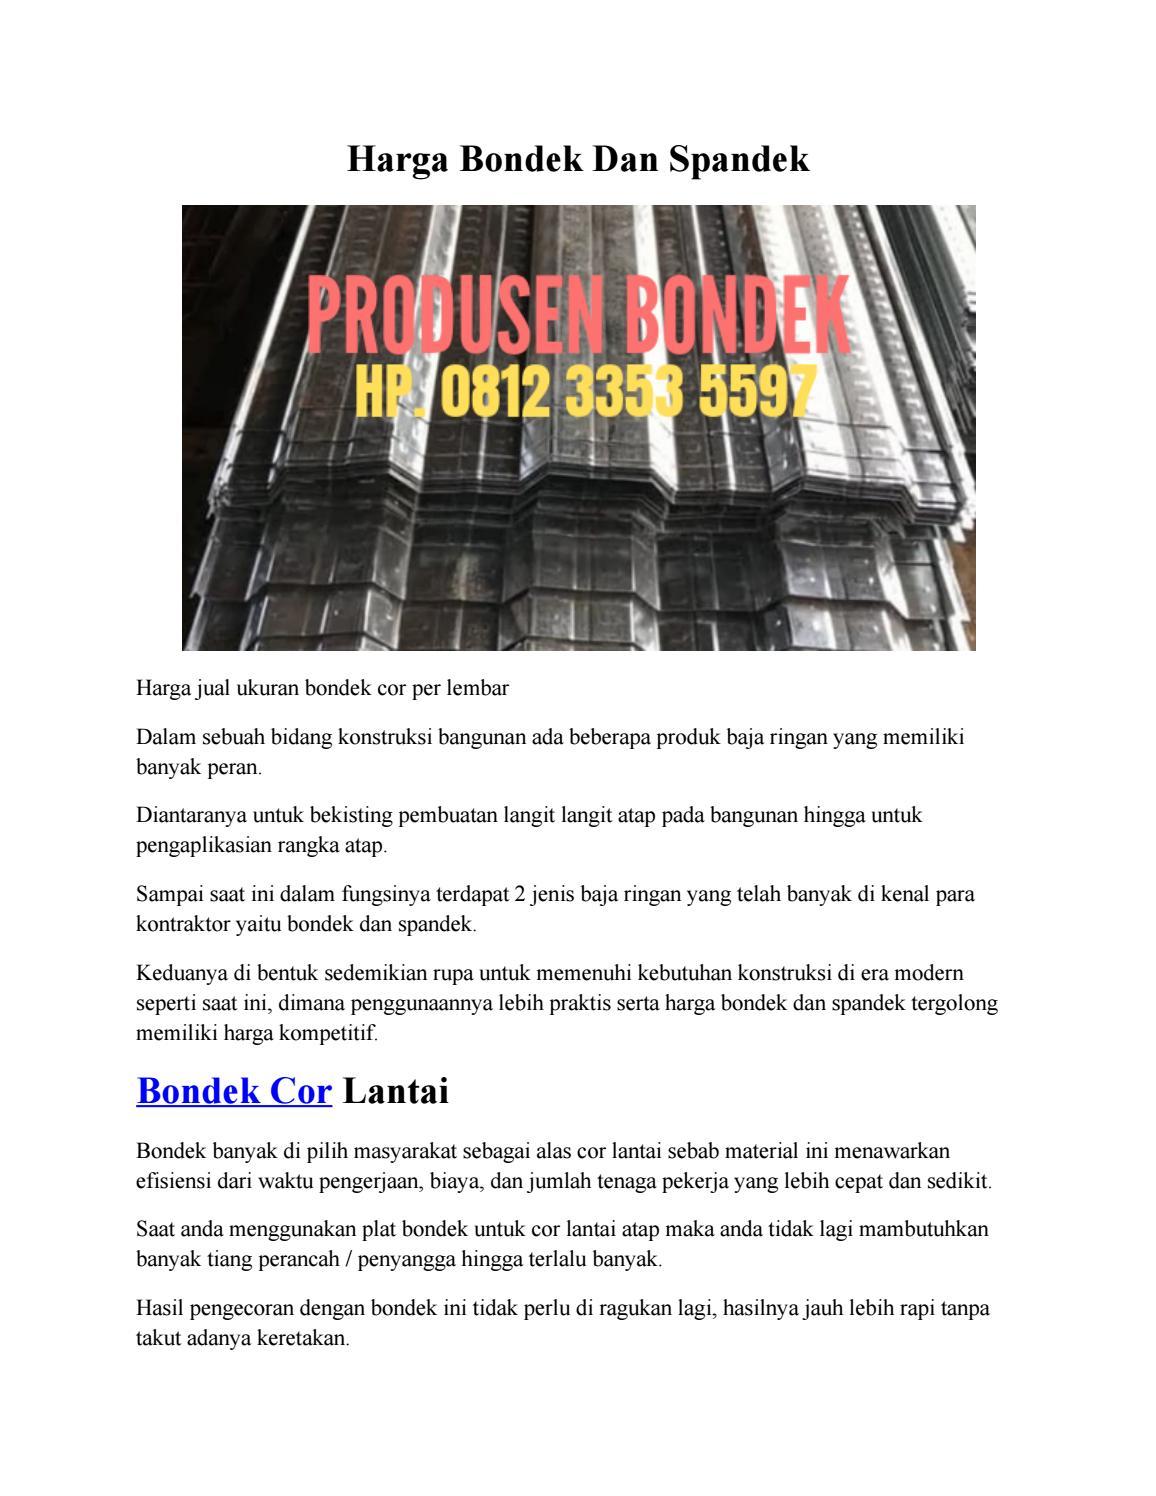 harga baja ringan buat ngecor bondek dan spandek hp 0812 3353 5597 by jualbondeksde issuu